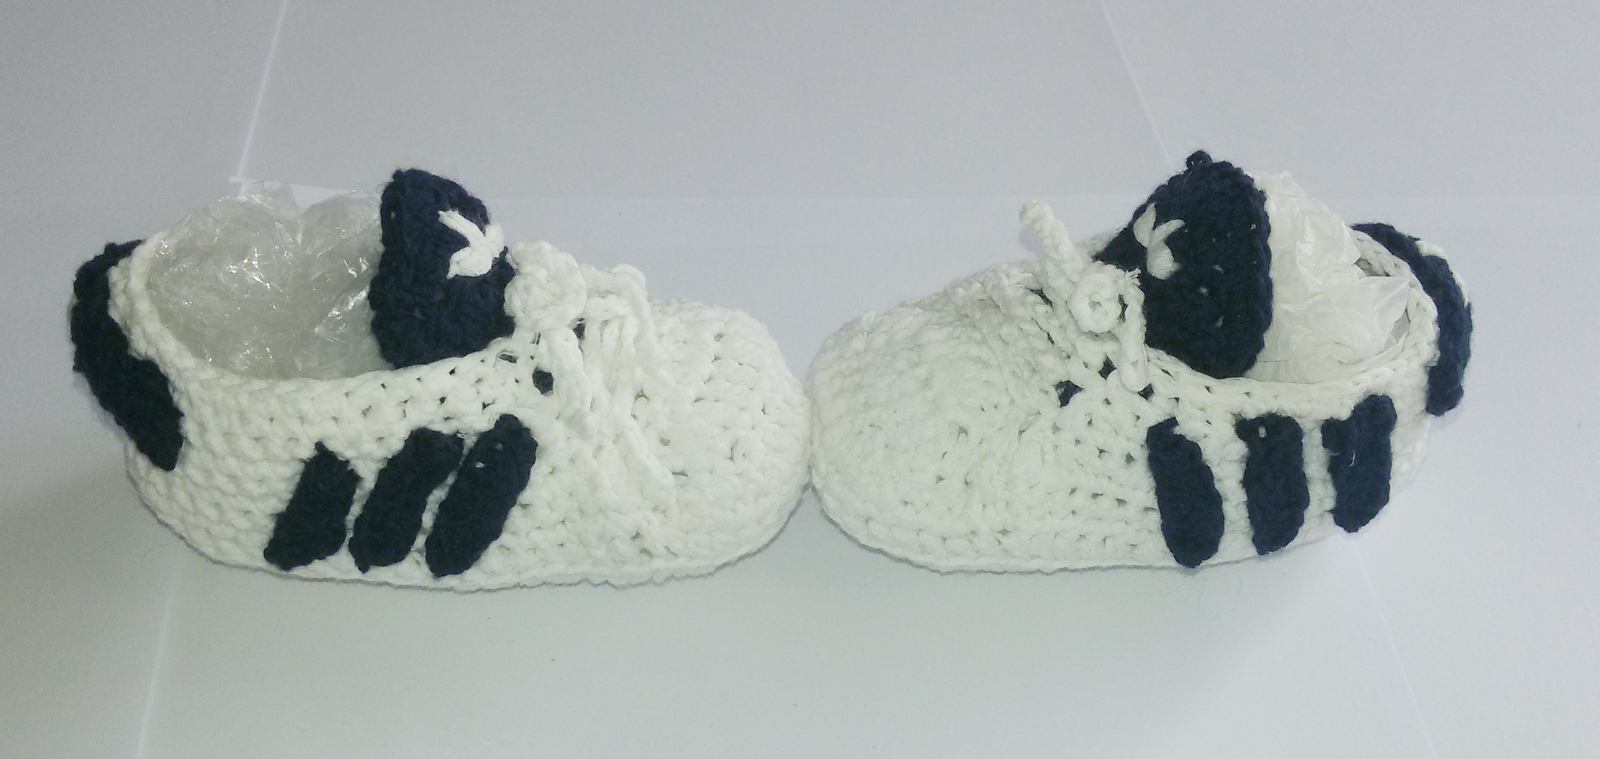 baby-shoes-like-adidas-2